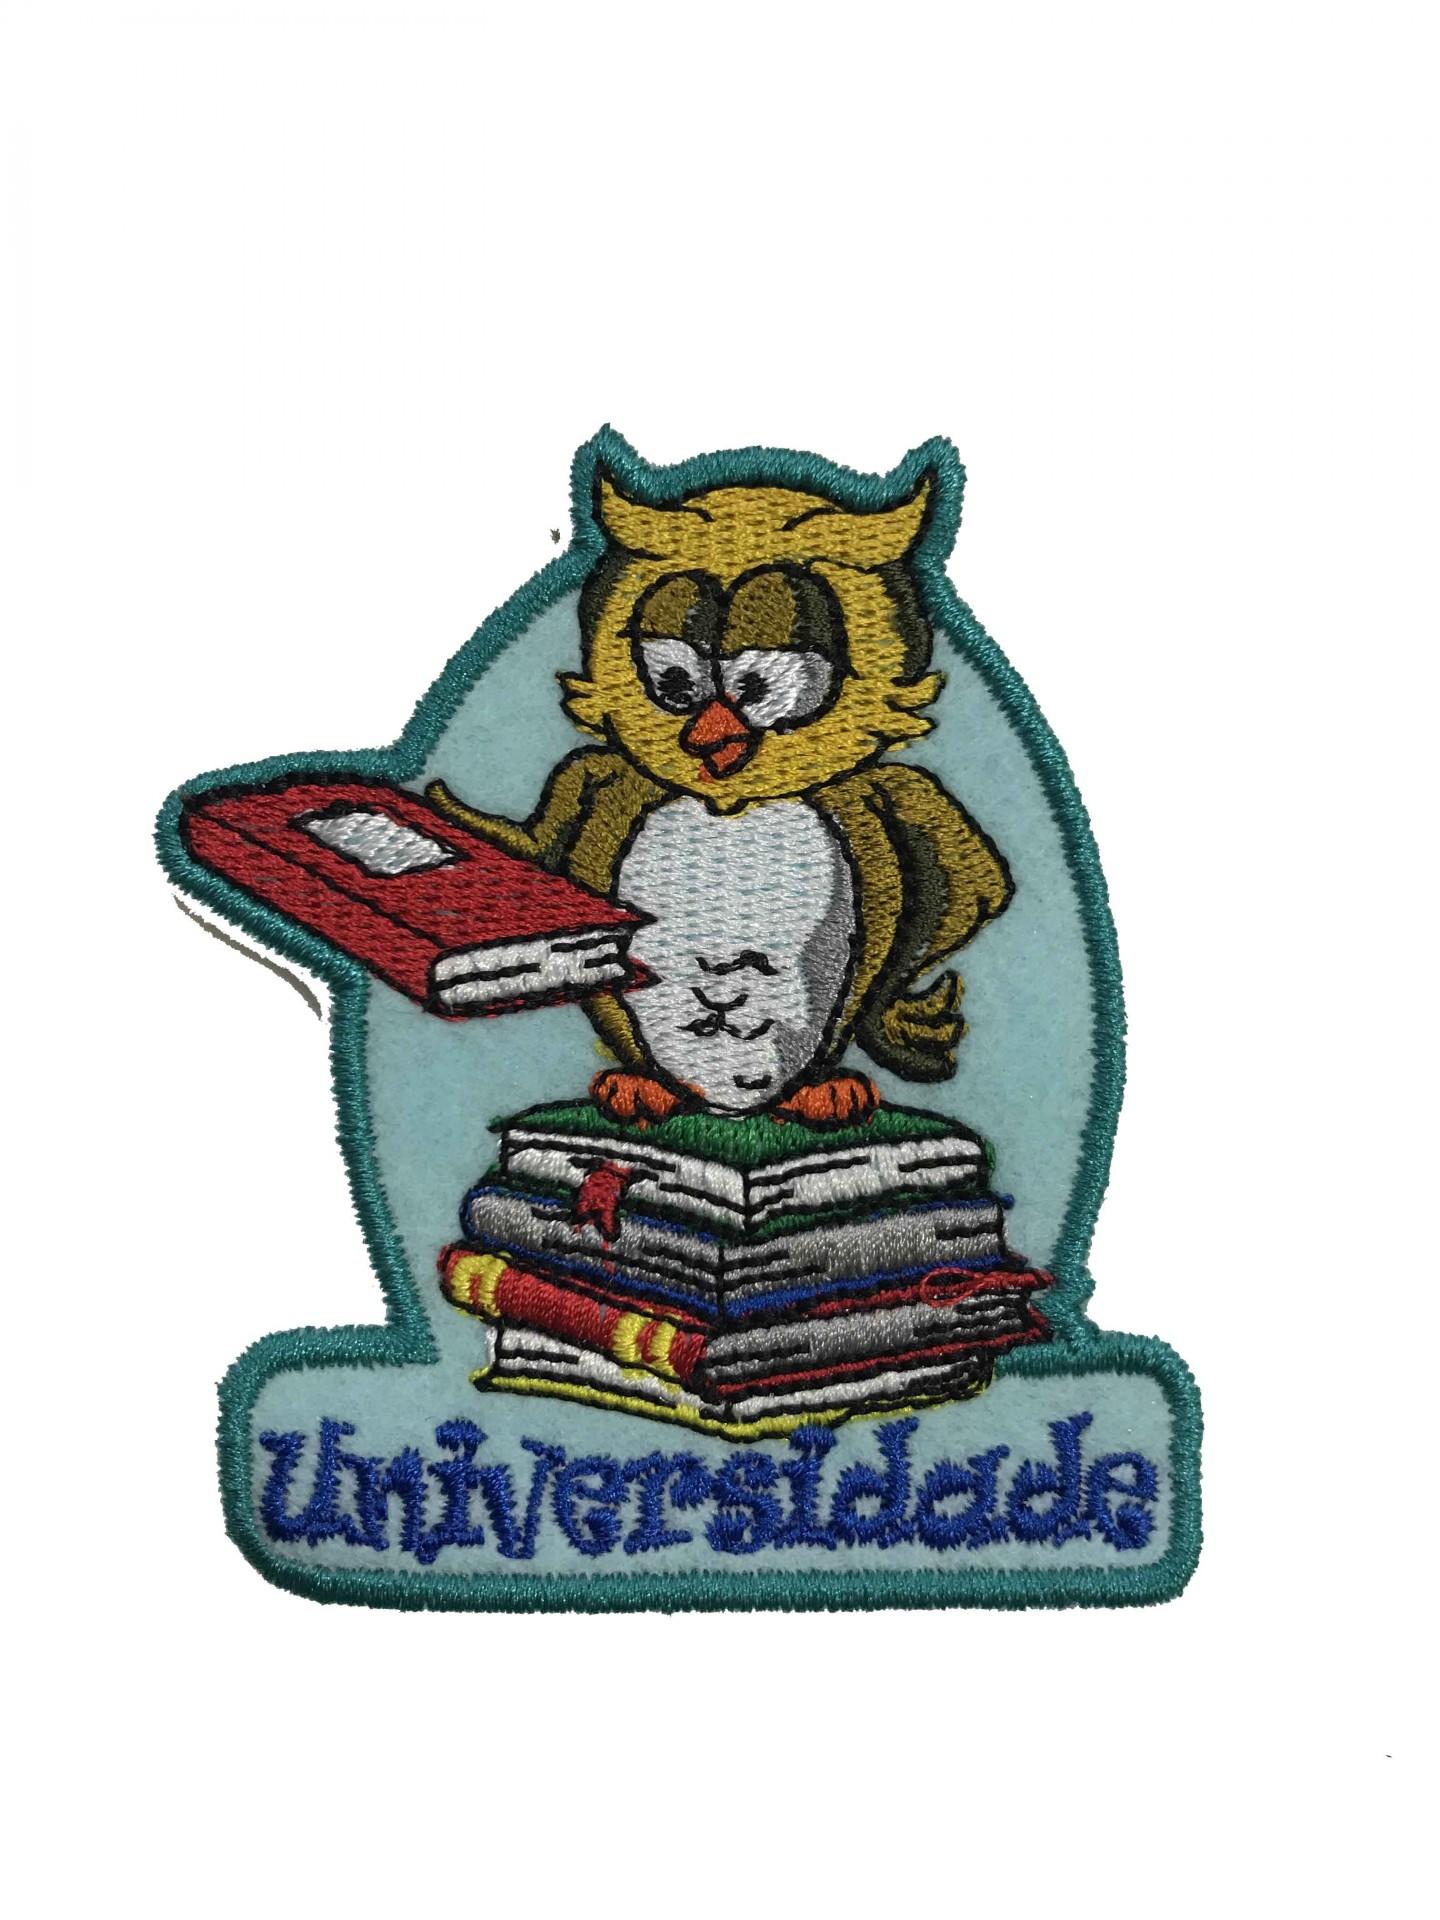 Emblema Universidade